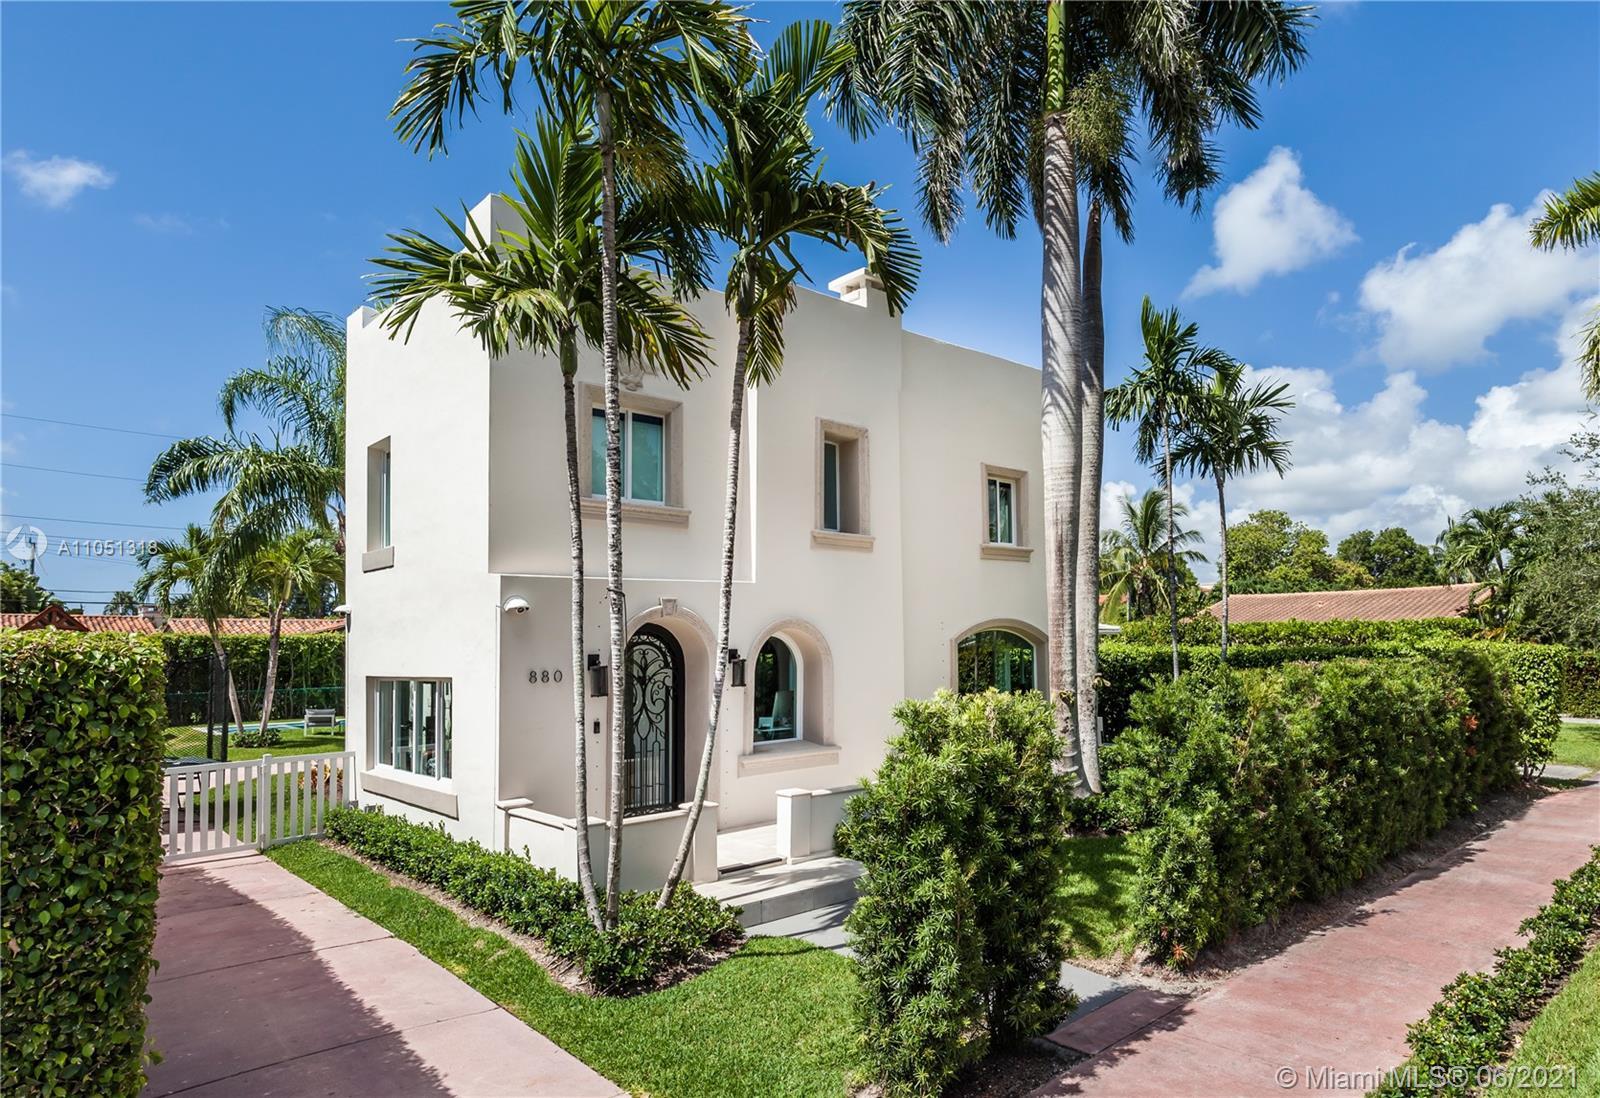 880 47th St, Miami Beach, Florida 33140